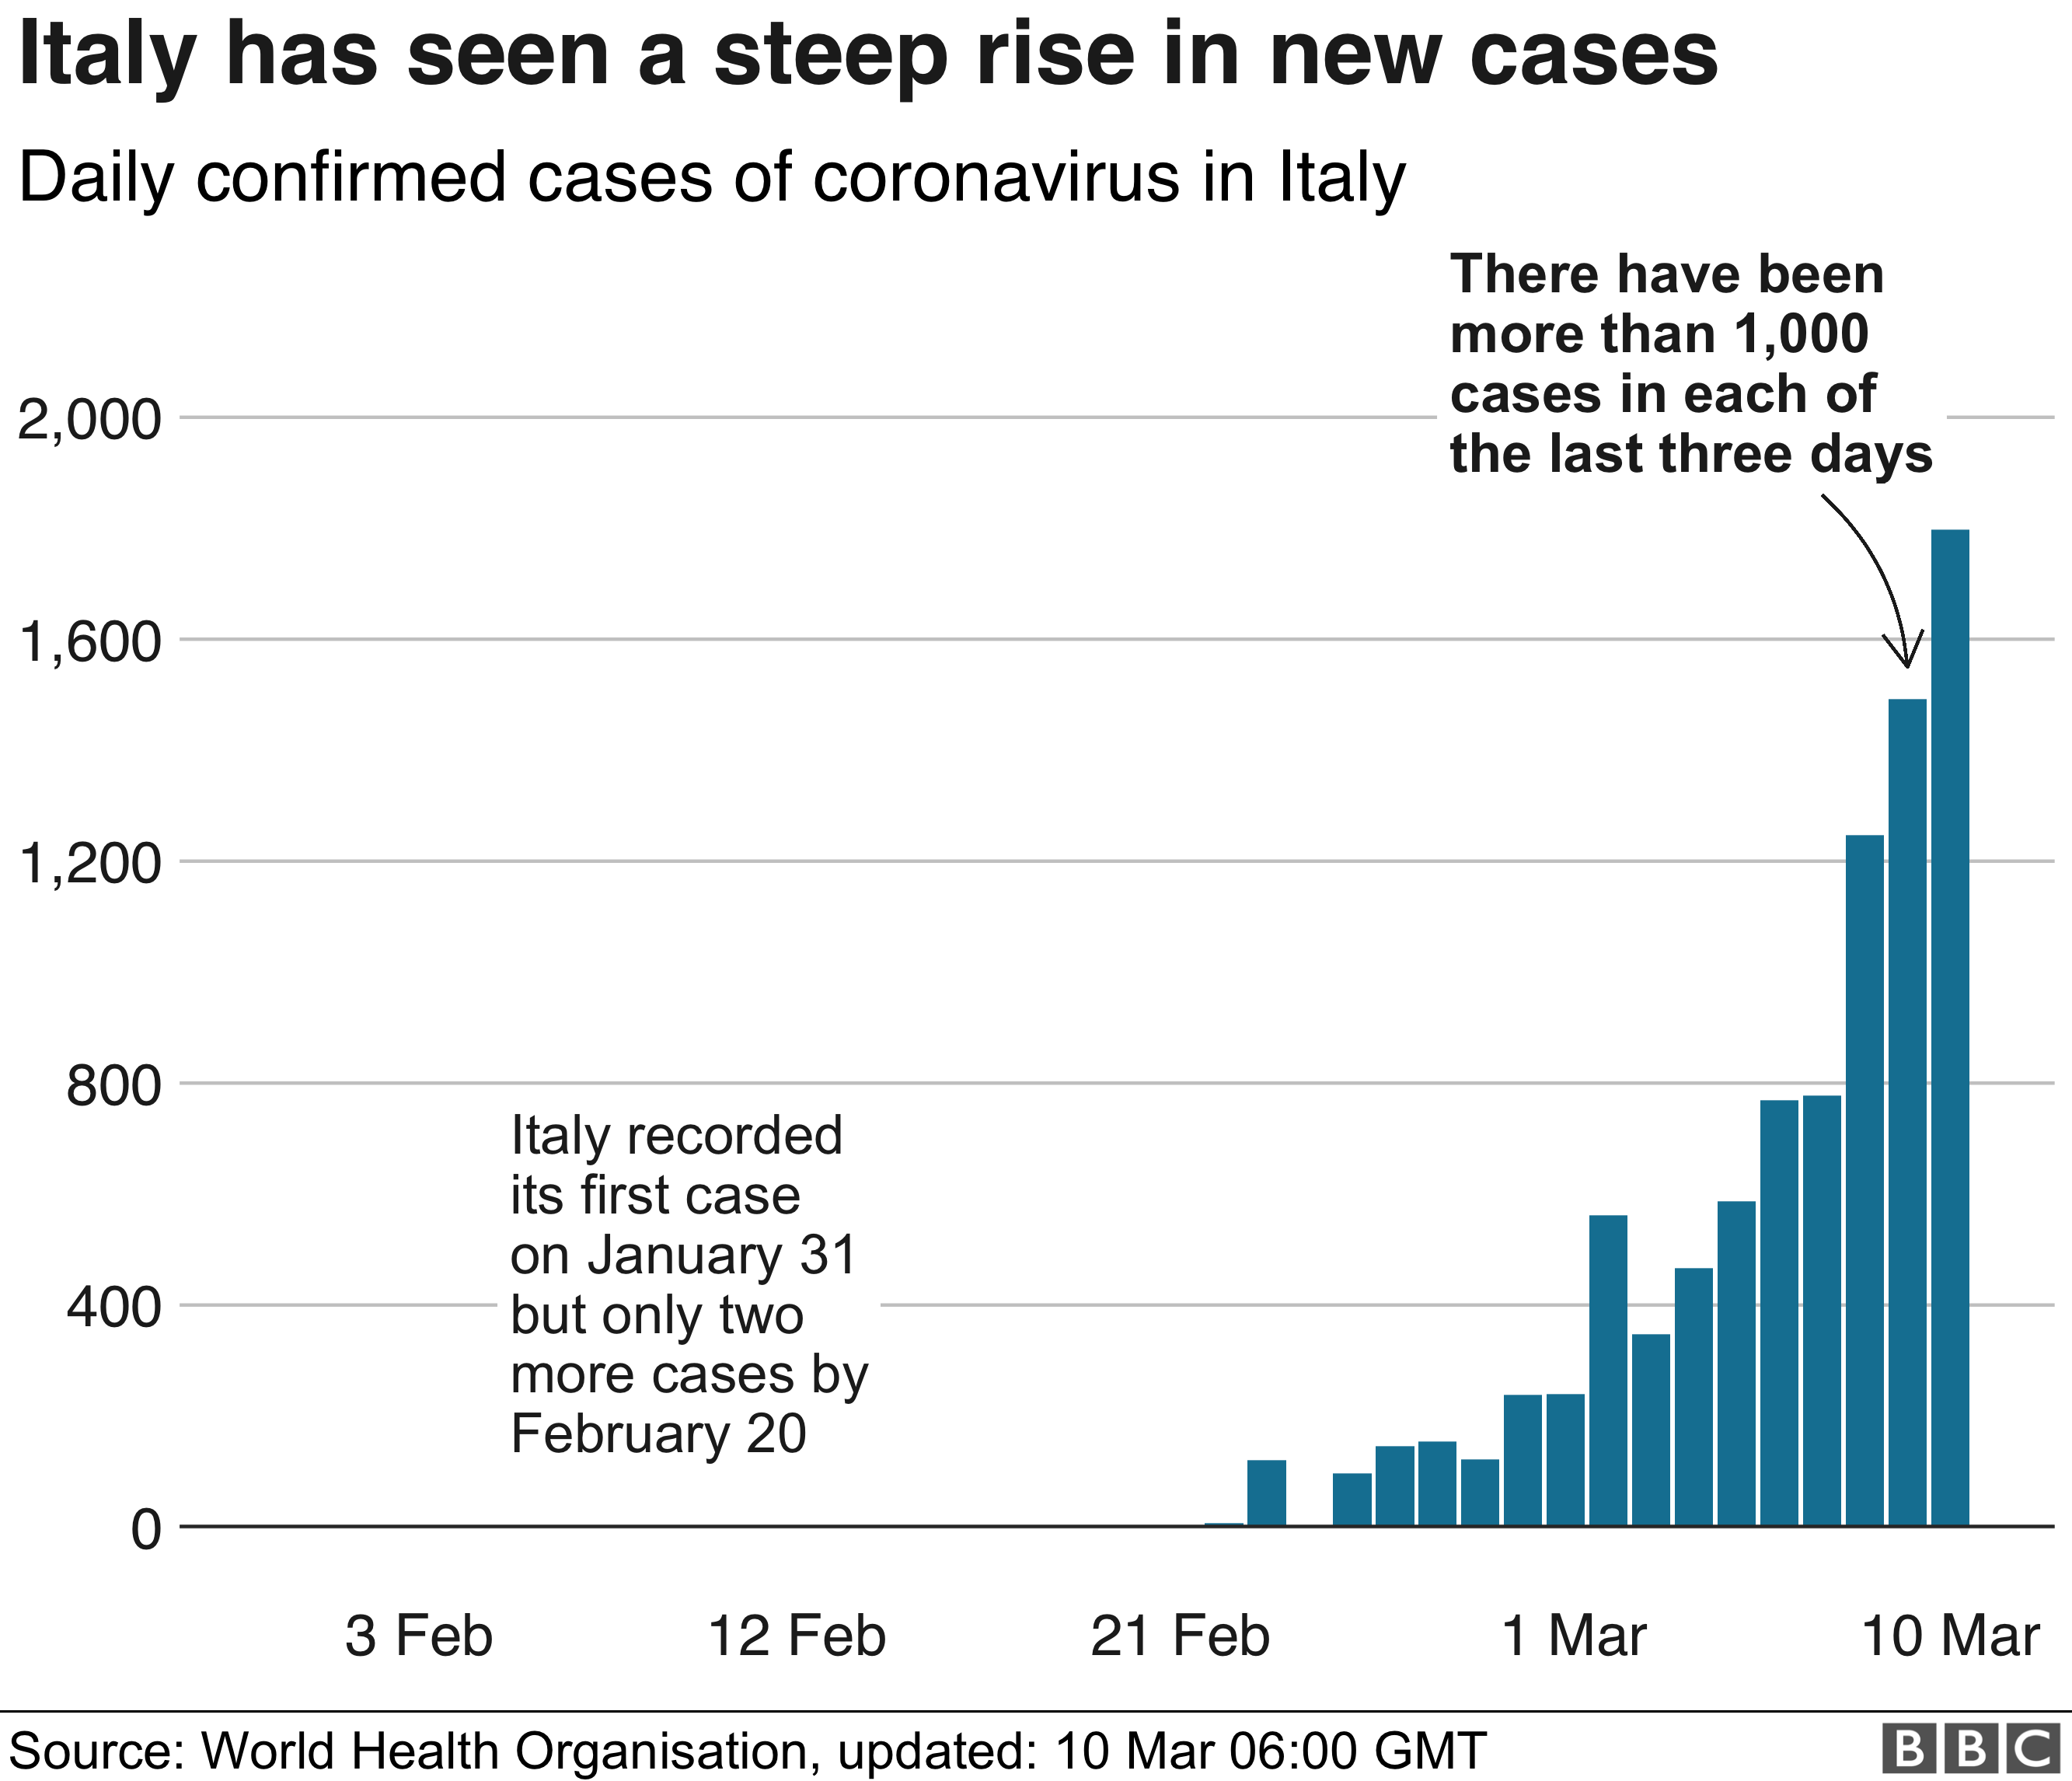 Italian cases of coronavirus